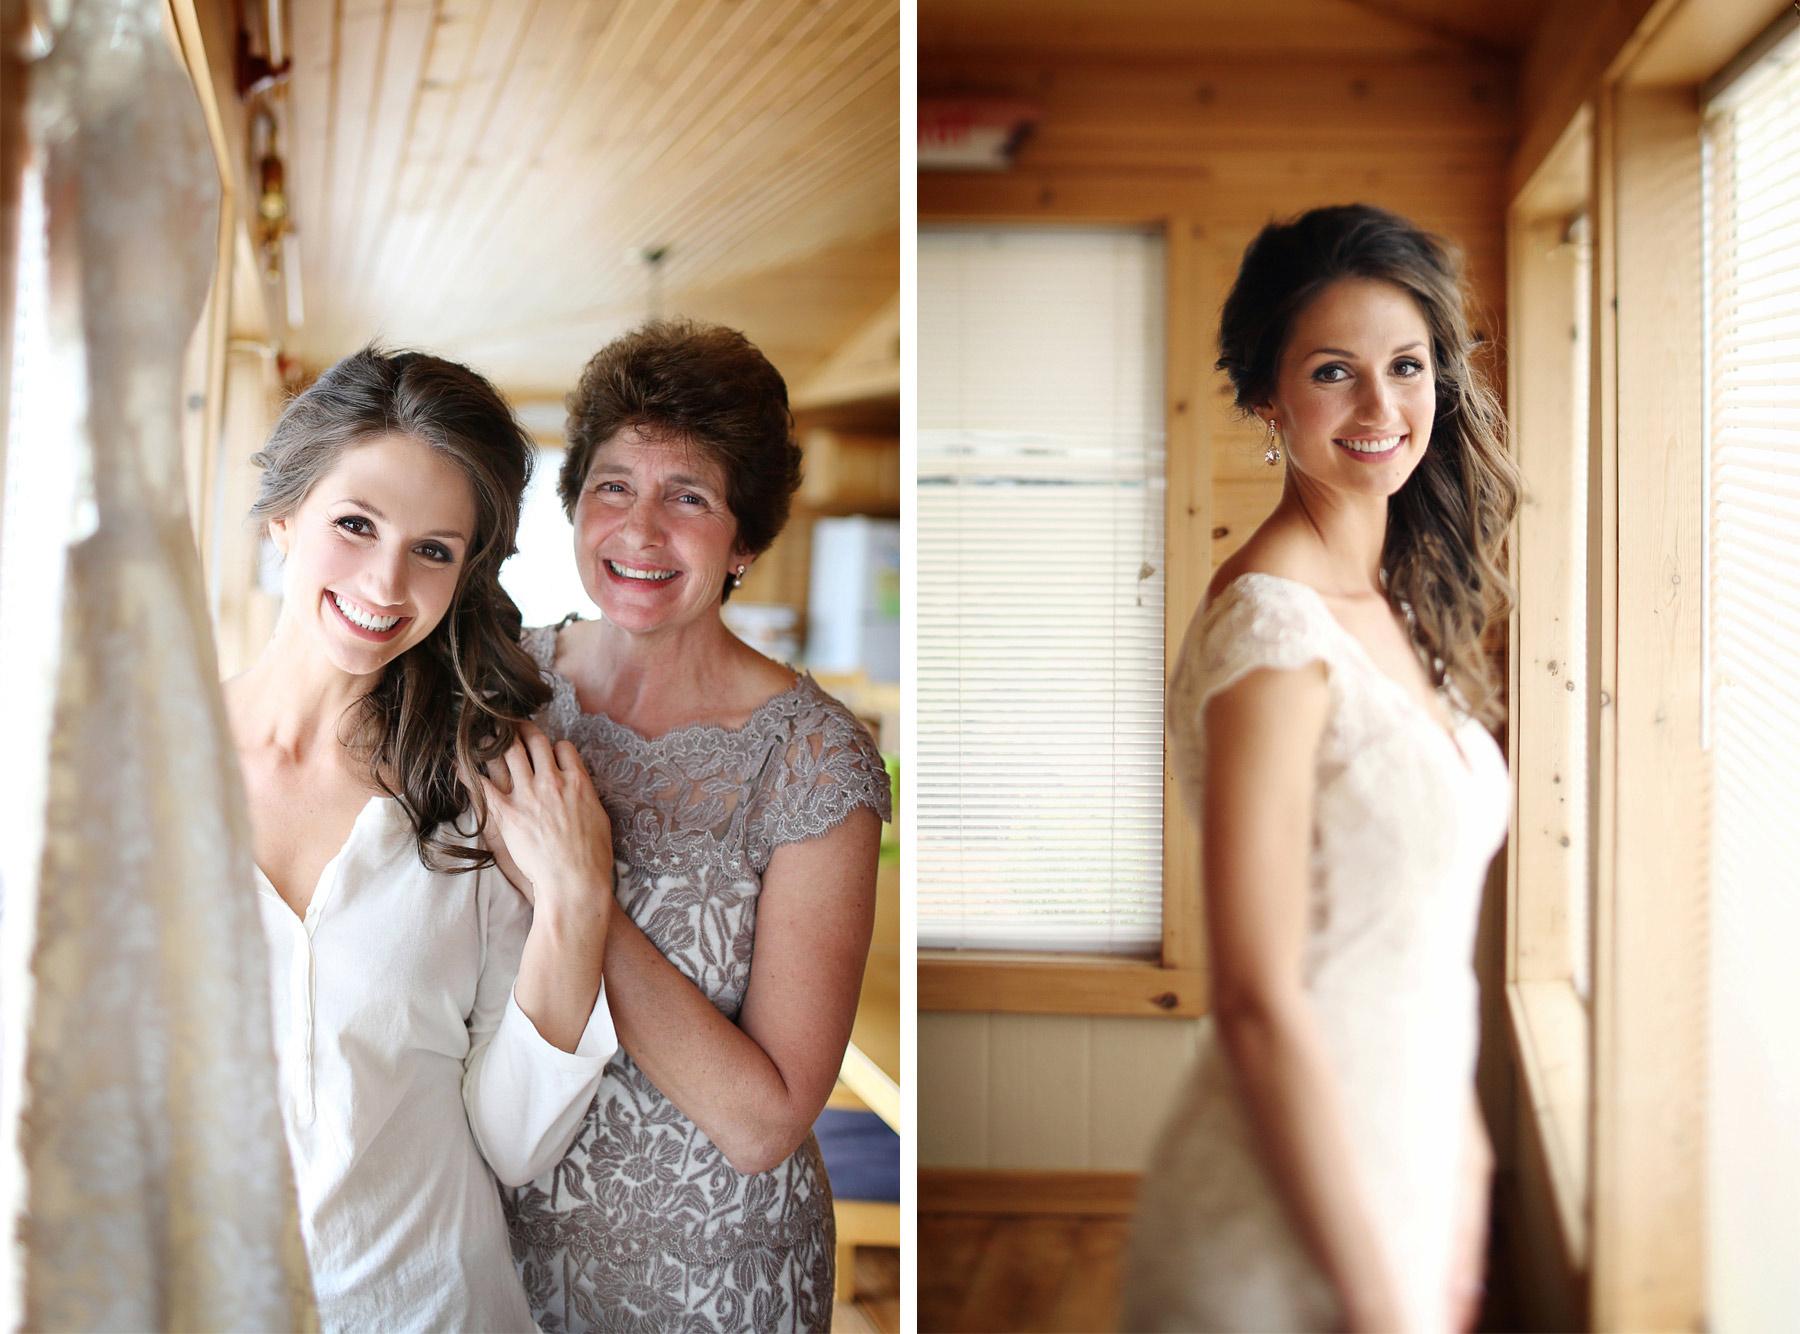 03-Stillwater-Minnesota-Wedding-Photography-by-Vick-Photography-Cabin-Wedding-Dresses-Alicia-&-Cole.jpg